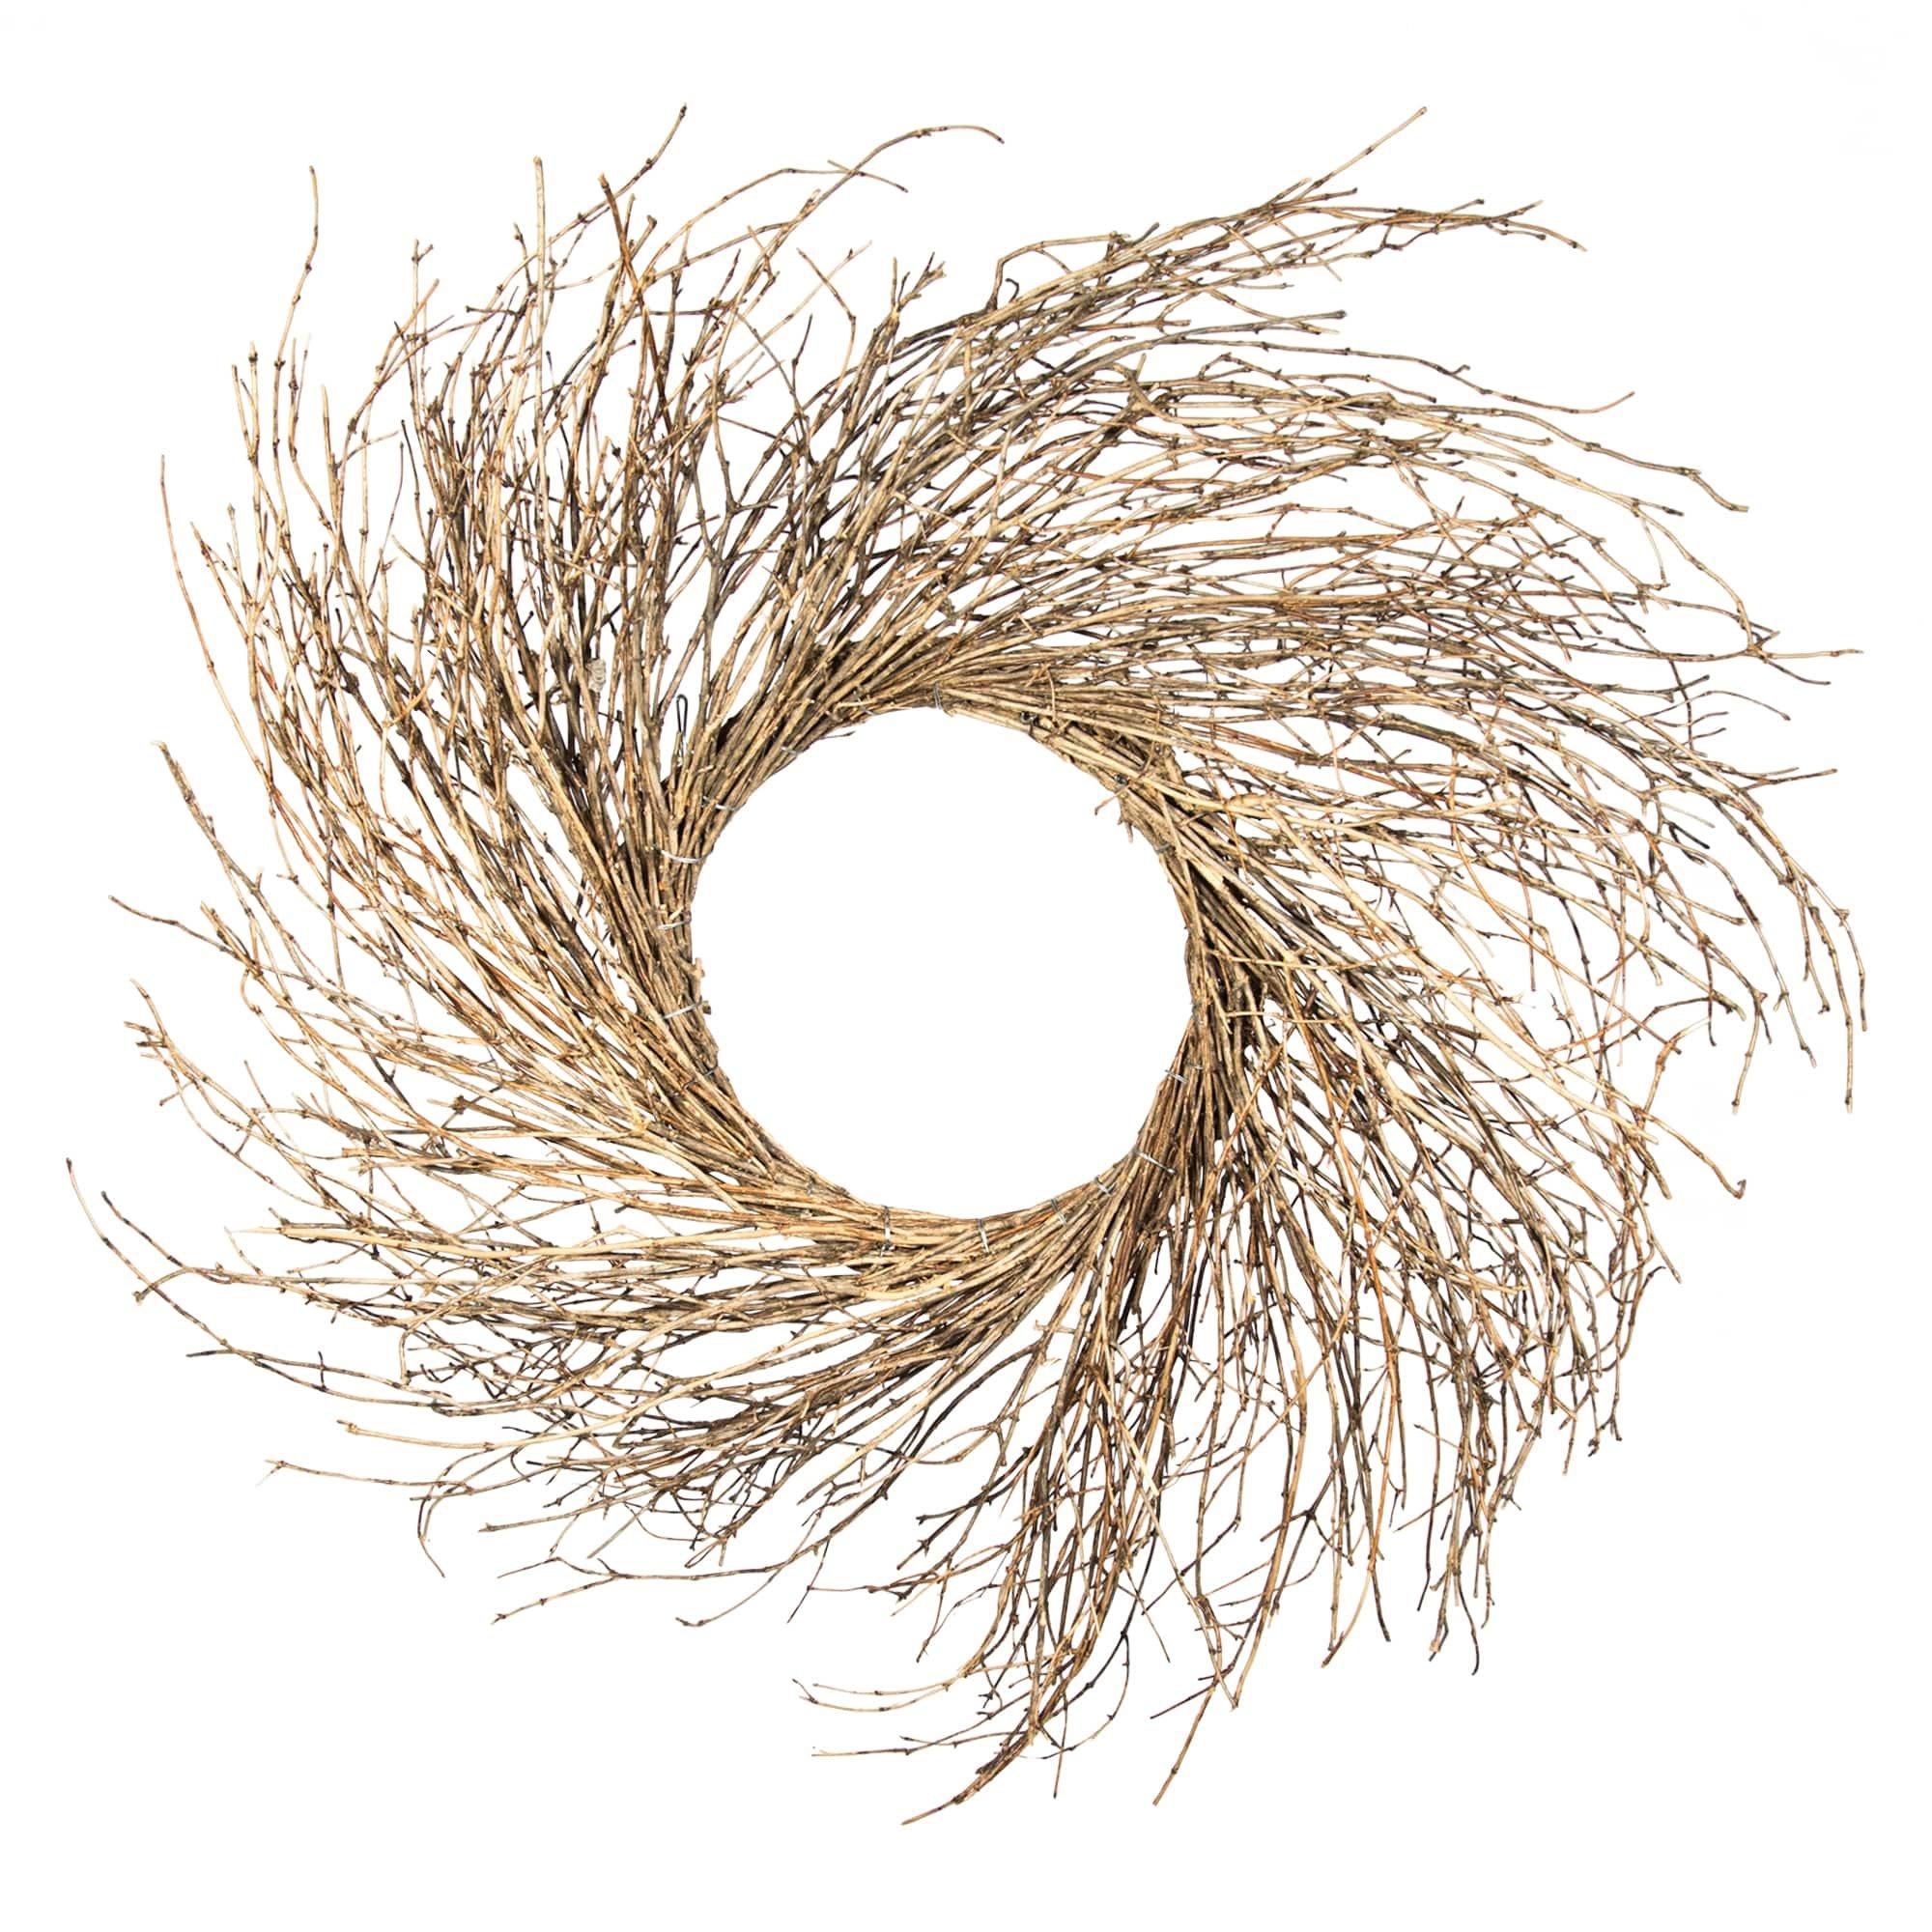 Shine Company 6632 Grapevine Sunburst Wreath, 36'', Natural